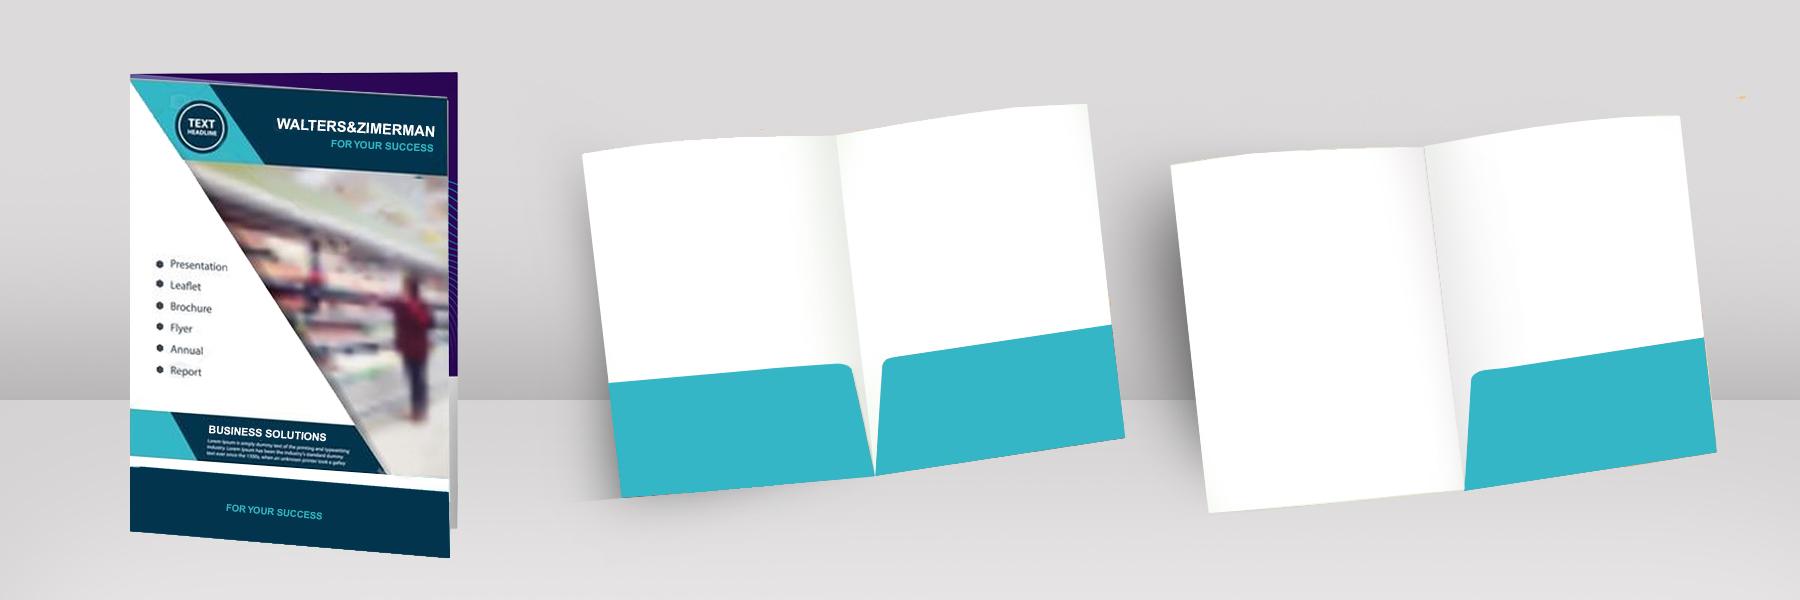 Presentation Folder Design & Print